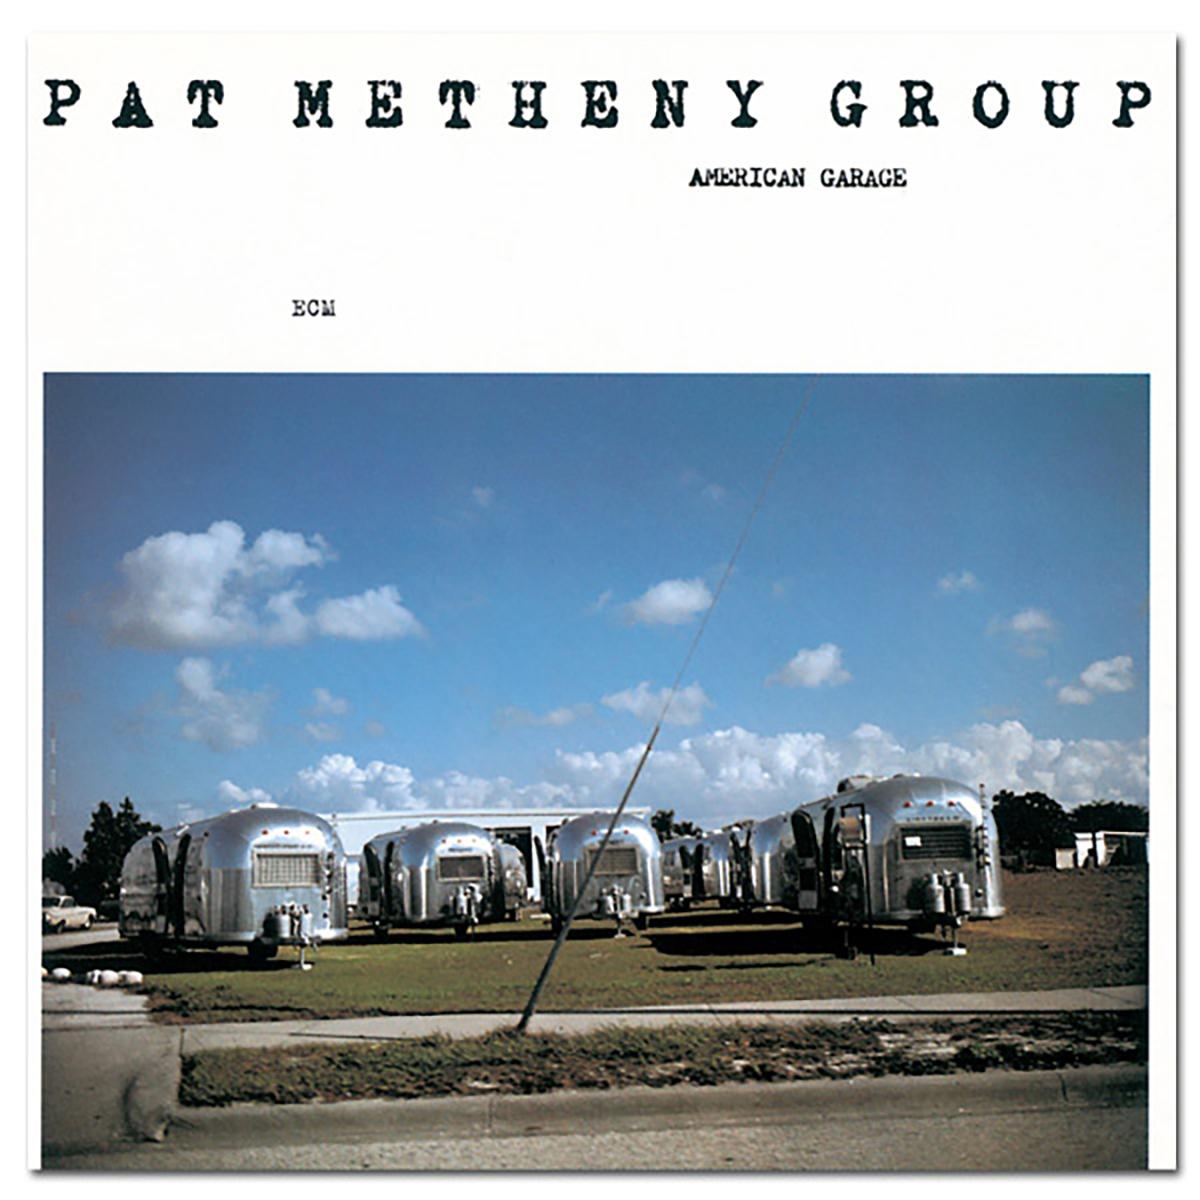 Pat Metheny Group- American Garage CD